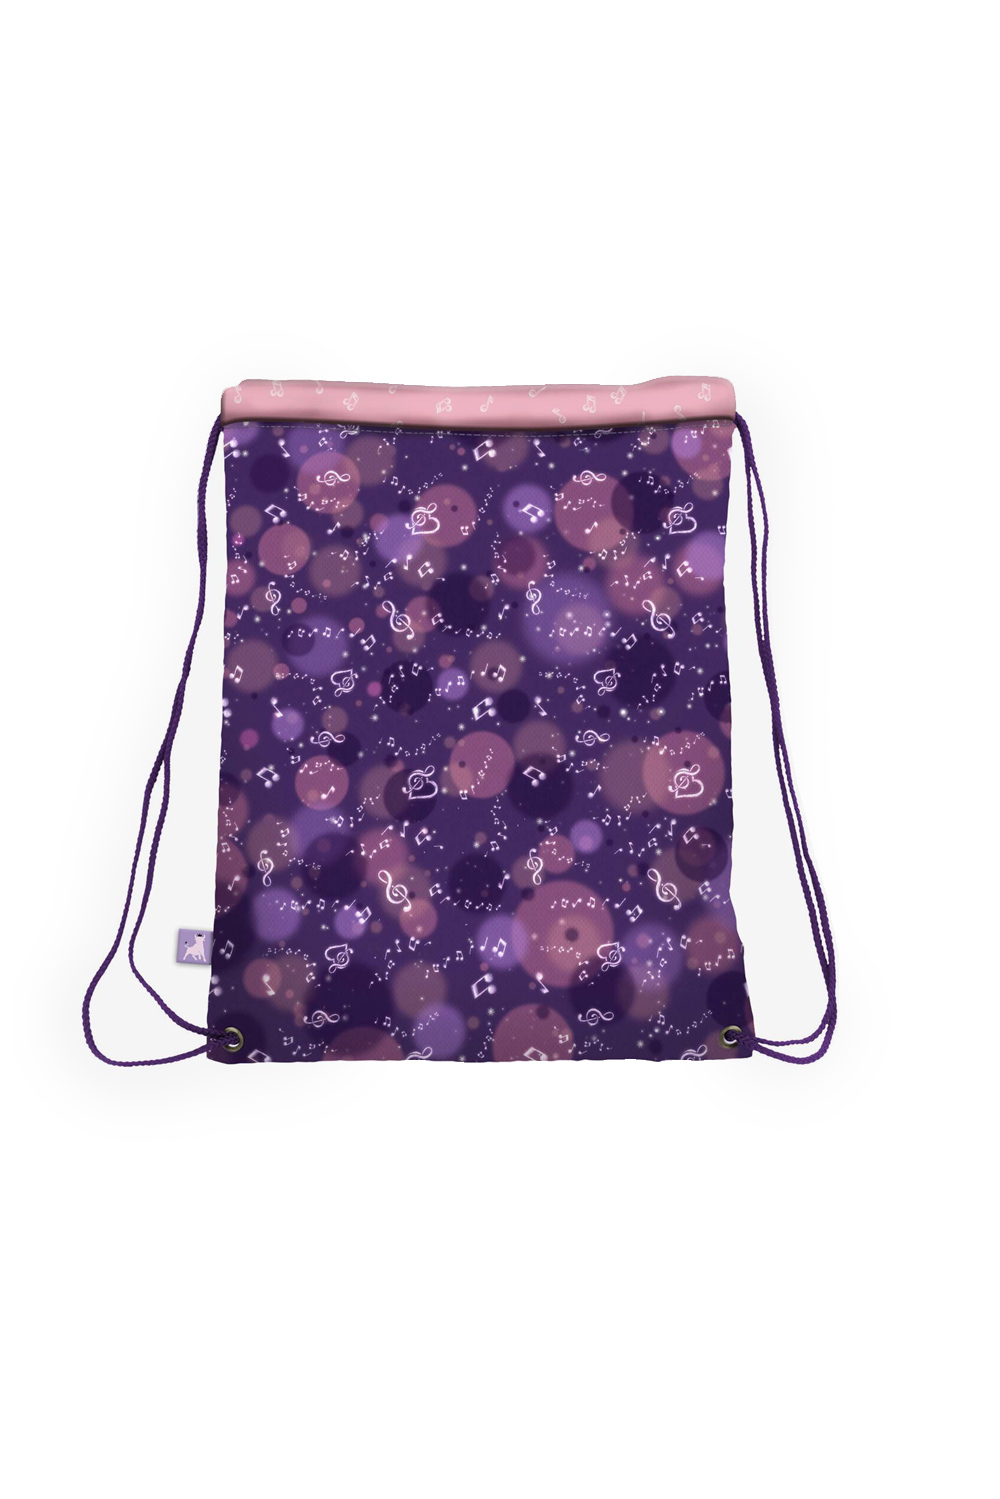 Santoro purple tighten drawstring bag Gorjuss The Duet